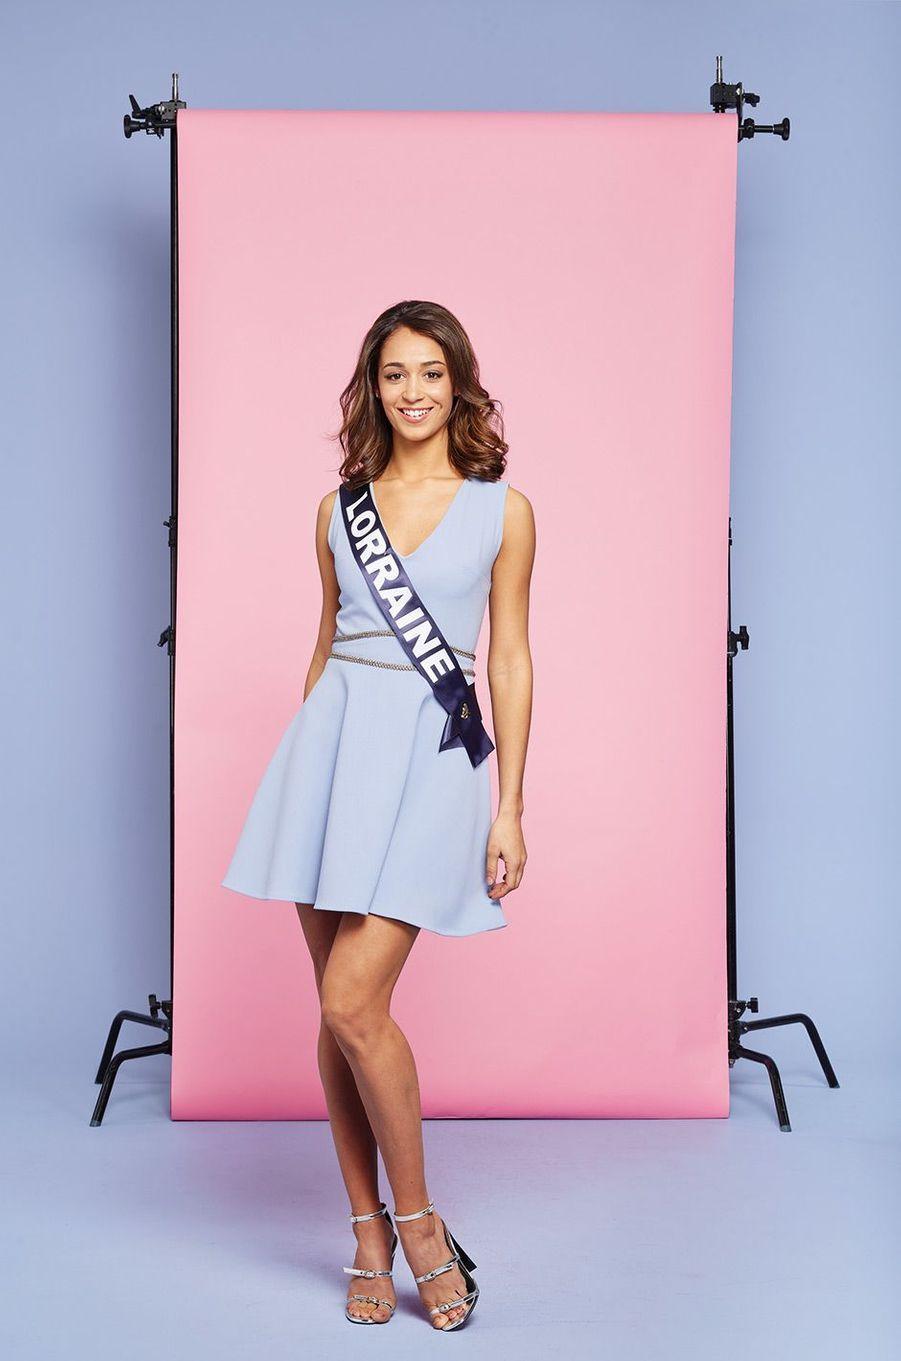 Miss Lorraine: Emma Virtz